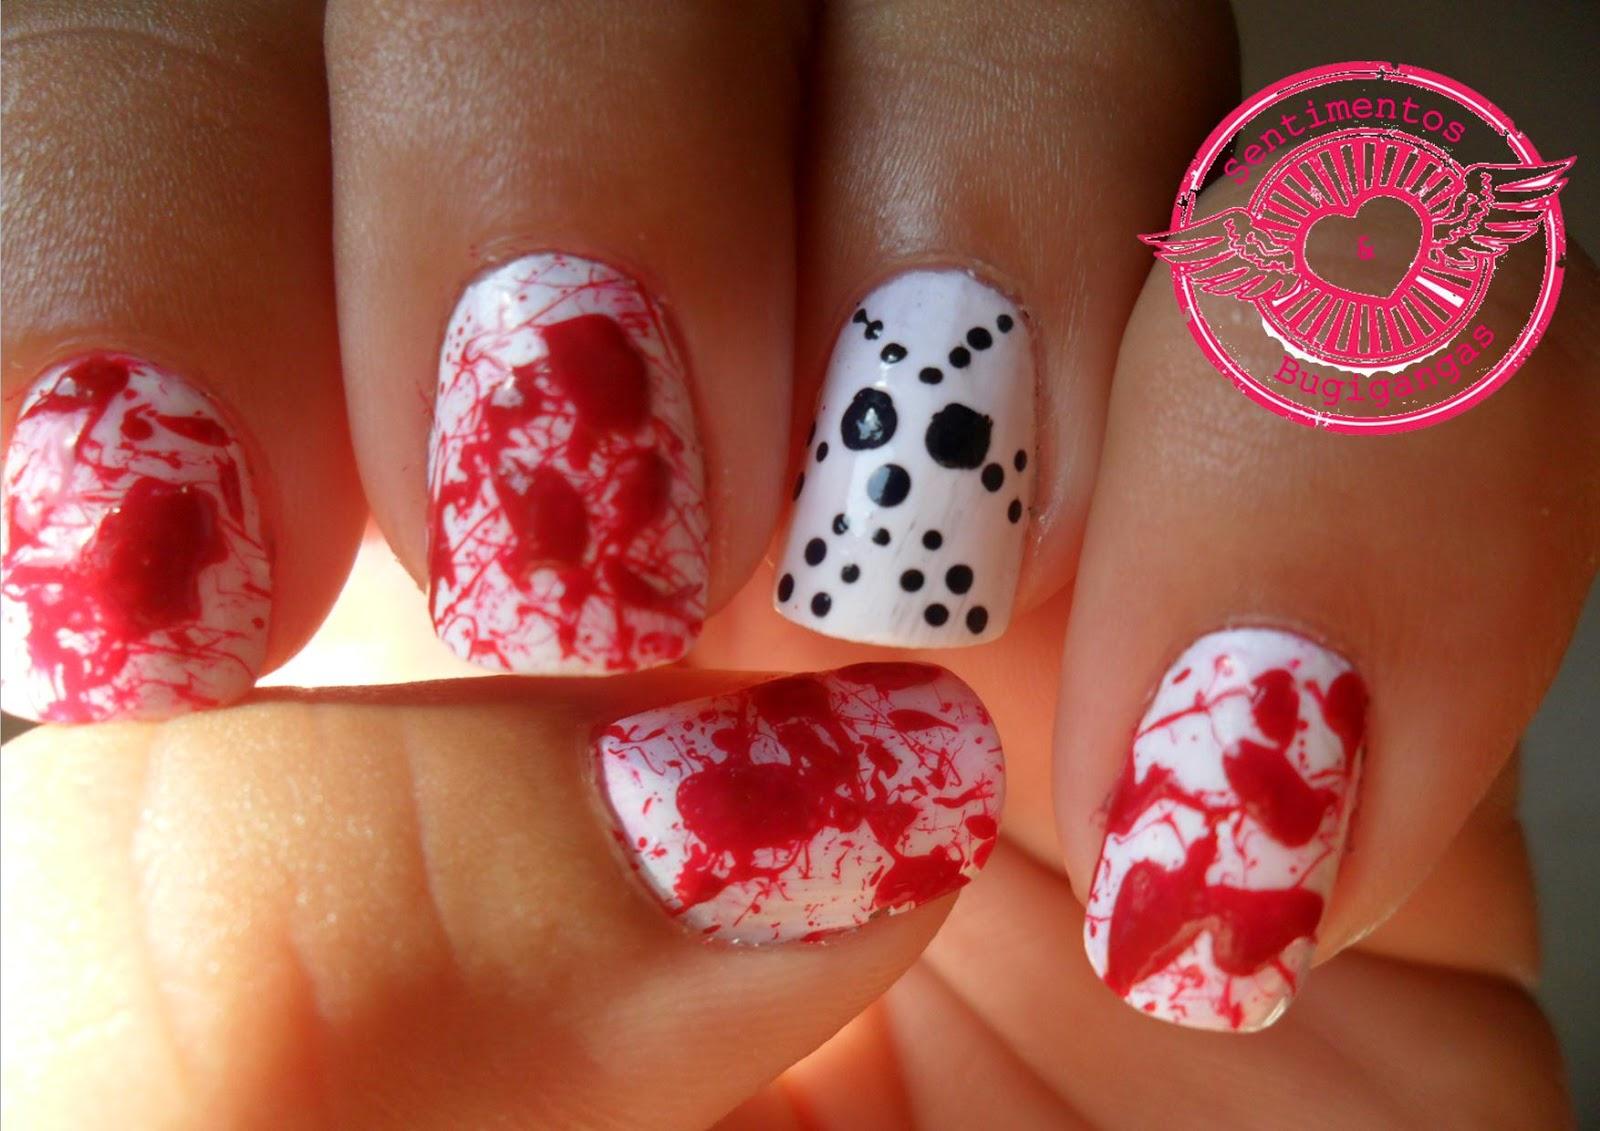 Jason Halloween Nail Art: Best images about nail art halloween on ...